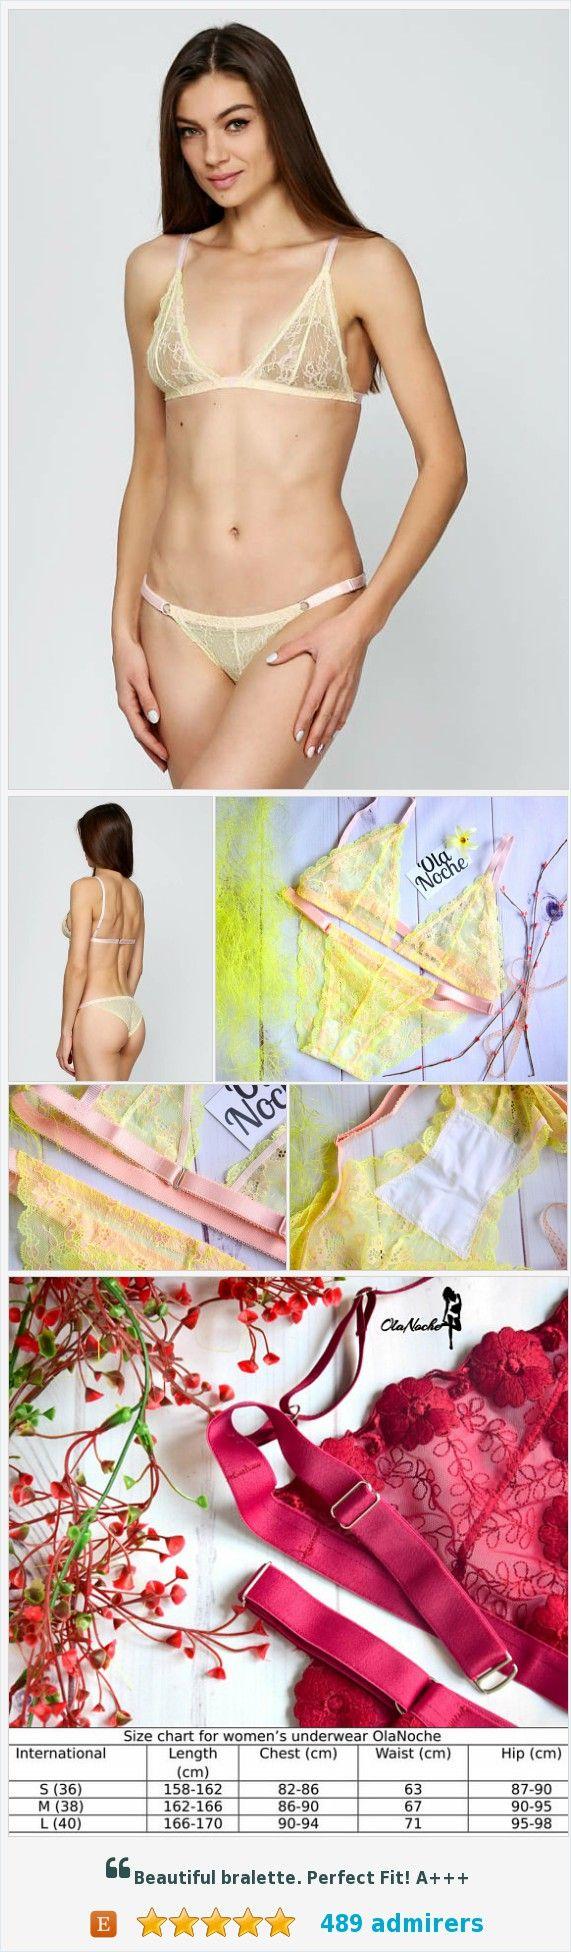 #Florallacebra #Naughtylingerie #Transparentlingerie #Lingerie #Olanoche https://www.etsy.com/OlaNoche/listing/559844875/sexy-lingerie-bralette-panty-set-bra?ref=shop_home_active_16